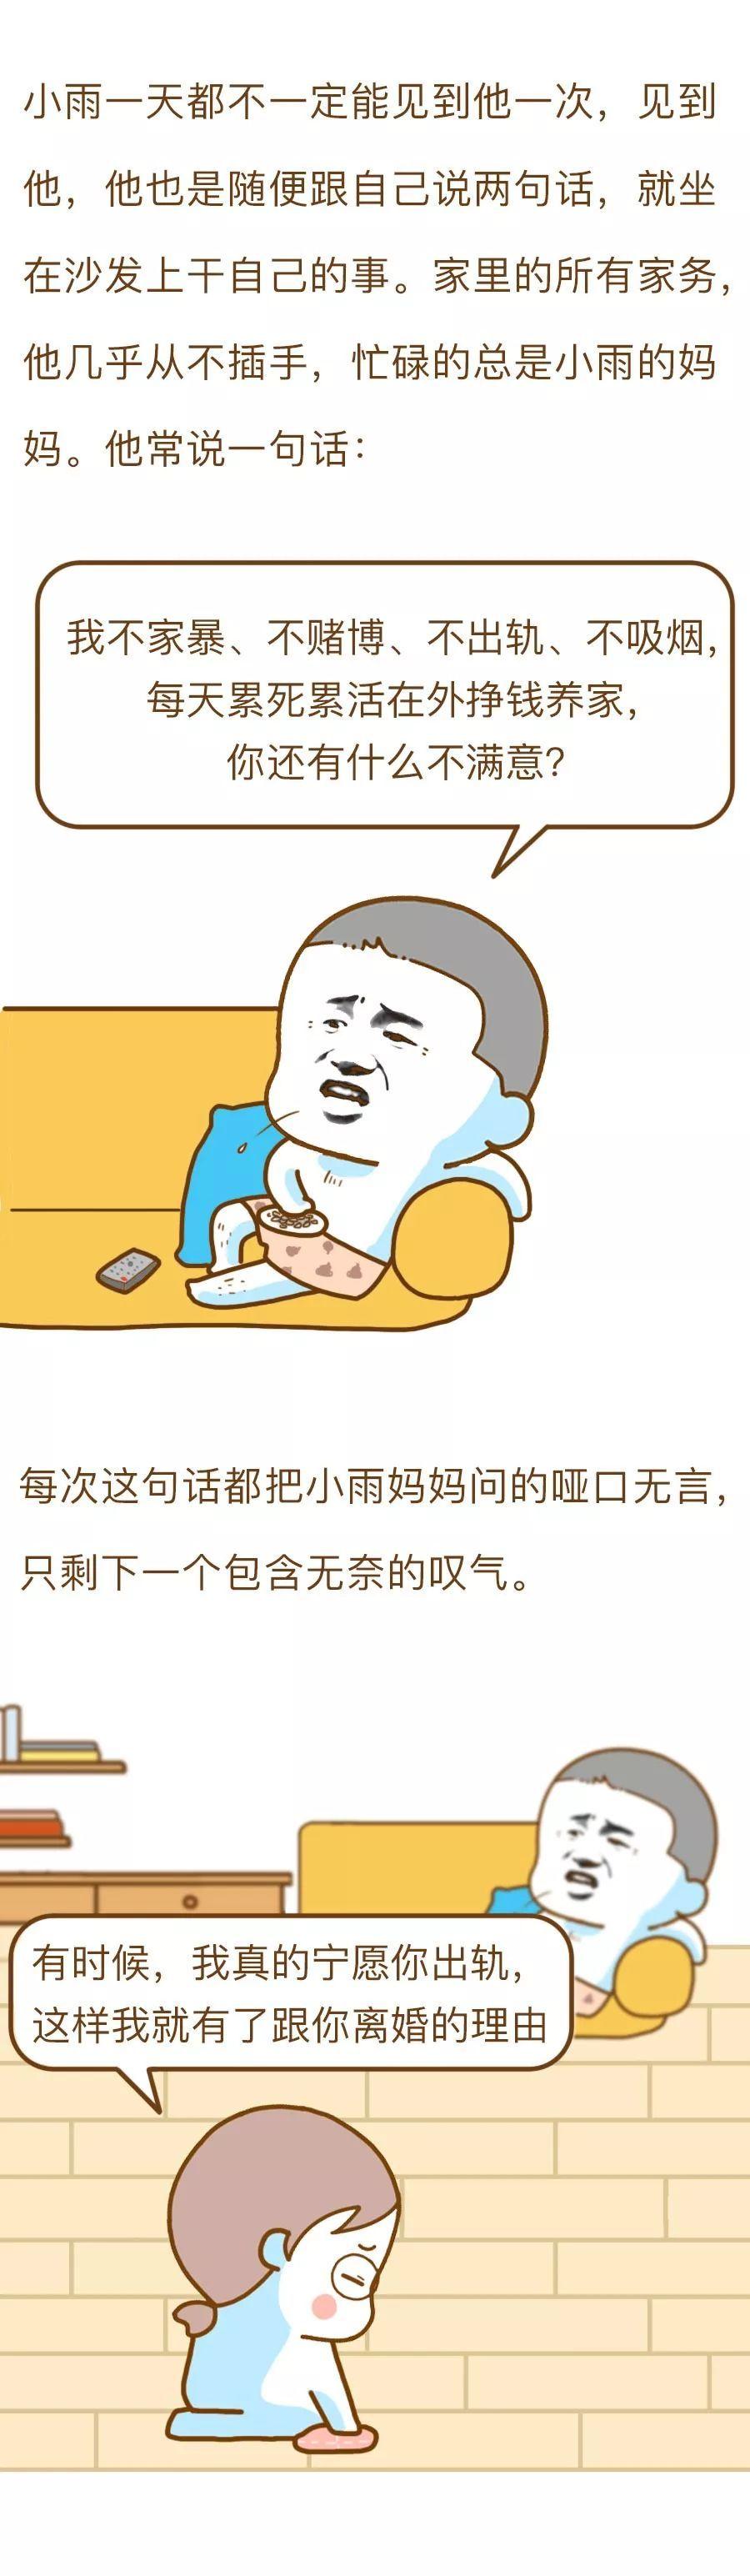 betway必威平台 18